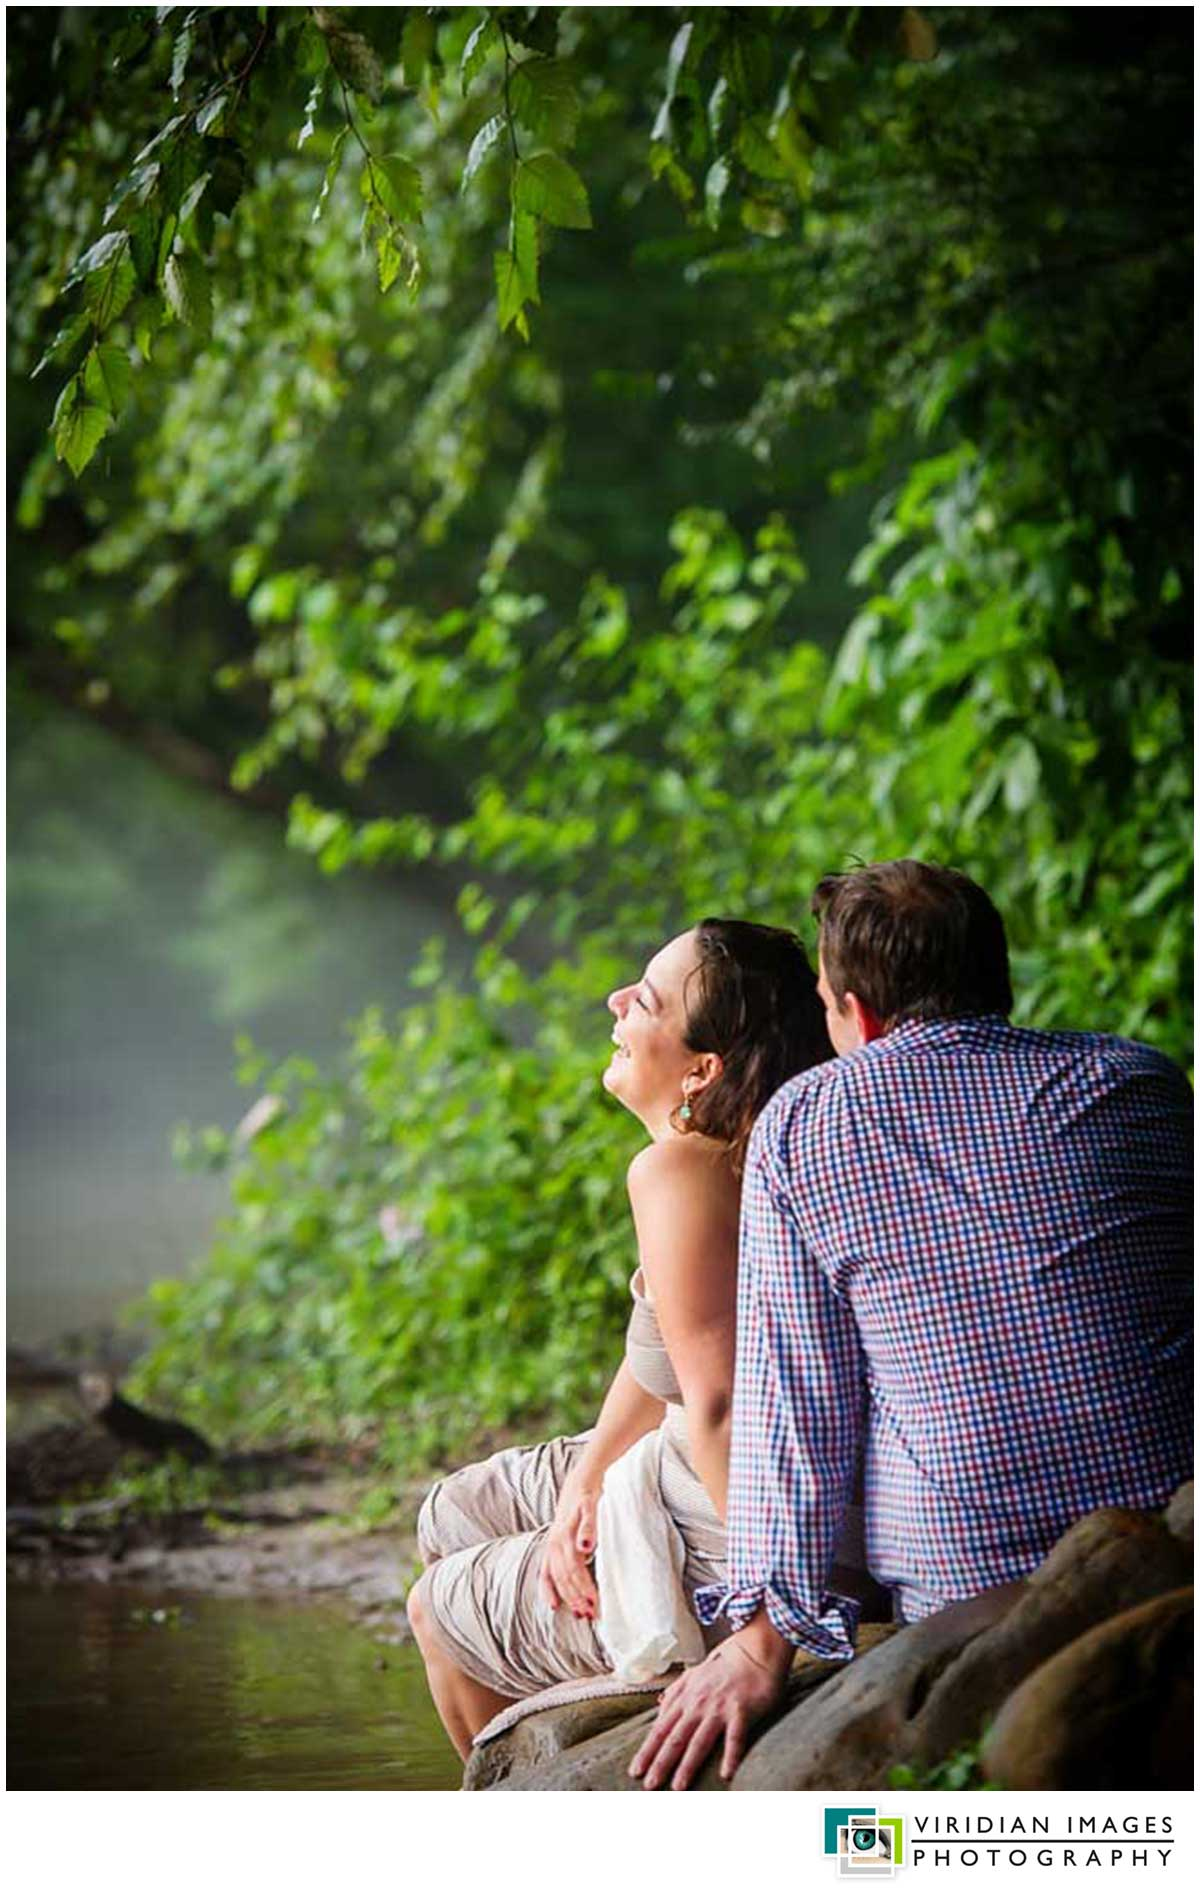 Atlanta Engagement_Chattahoochee River_Viridian Images Photography_Iain and Katja-9